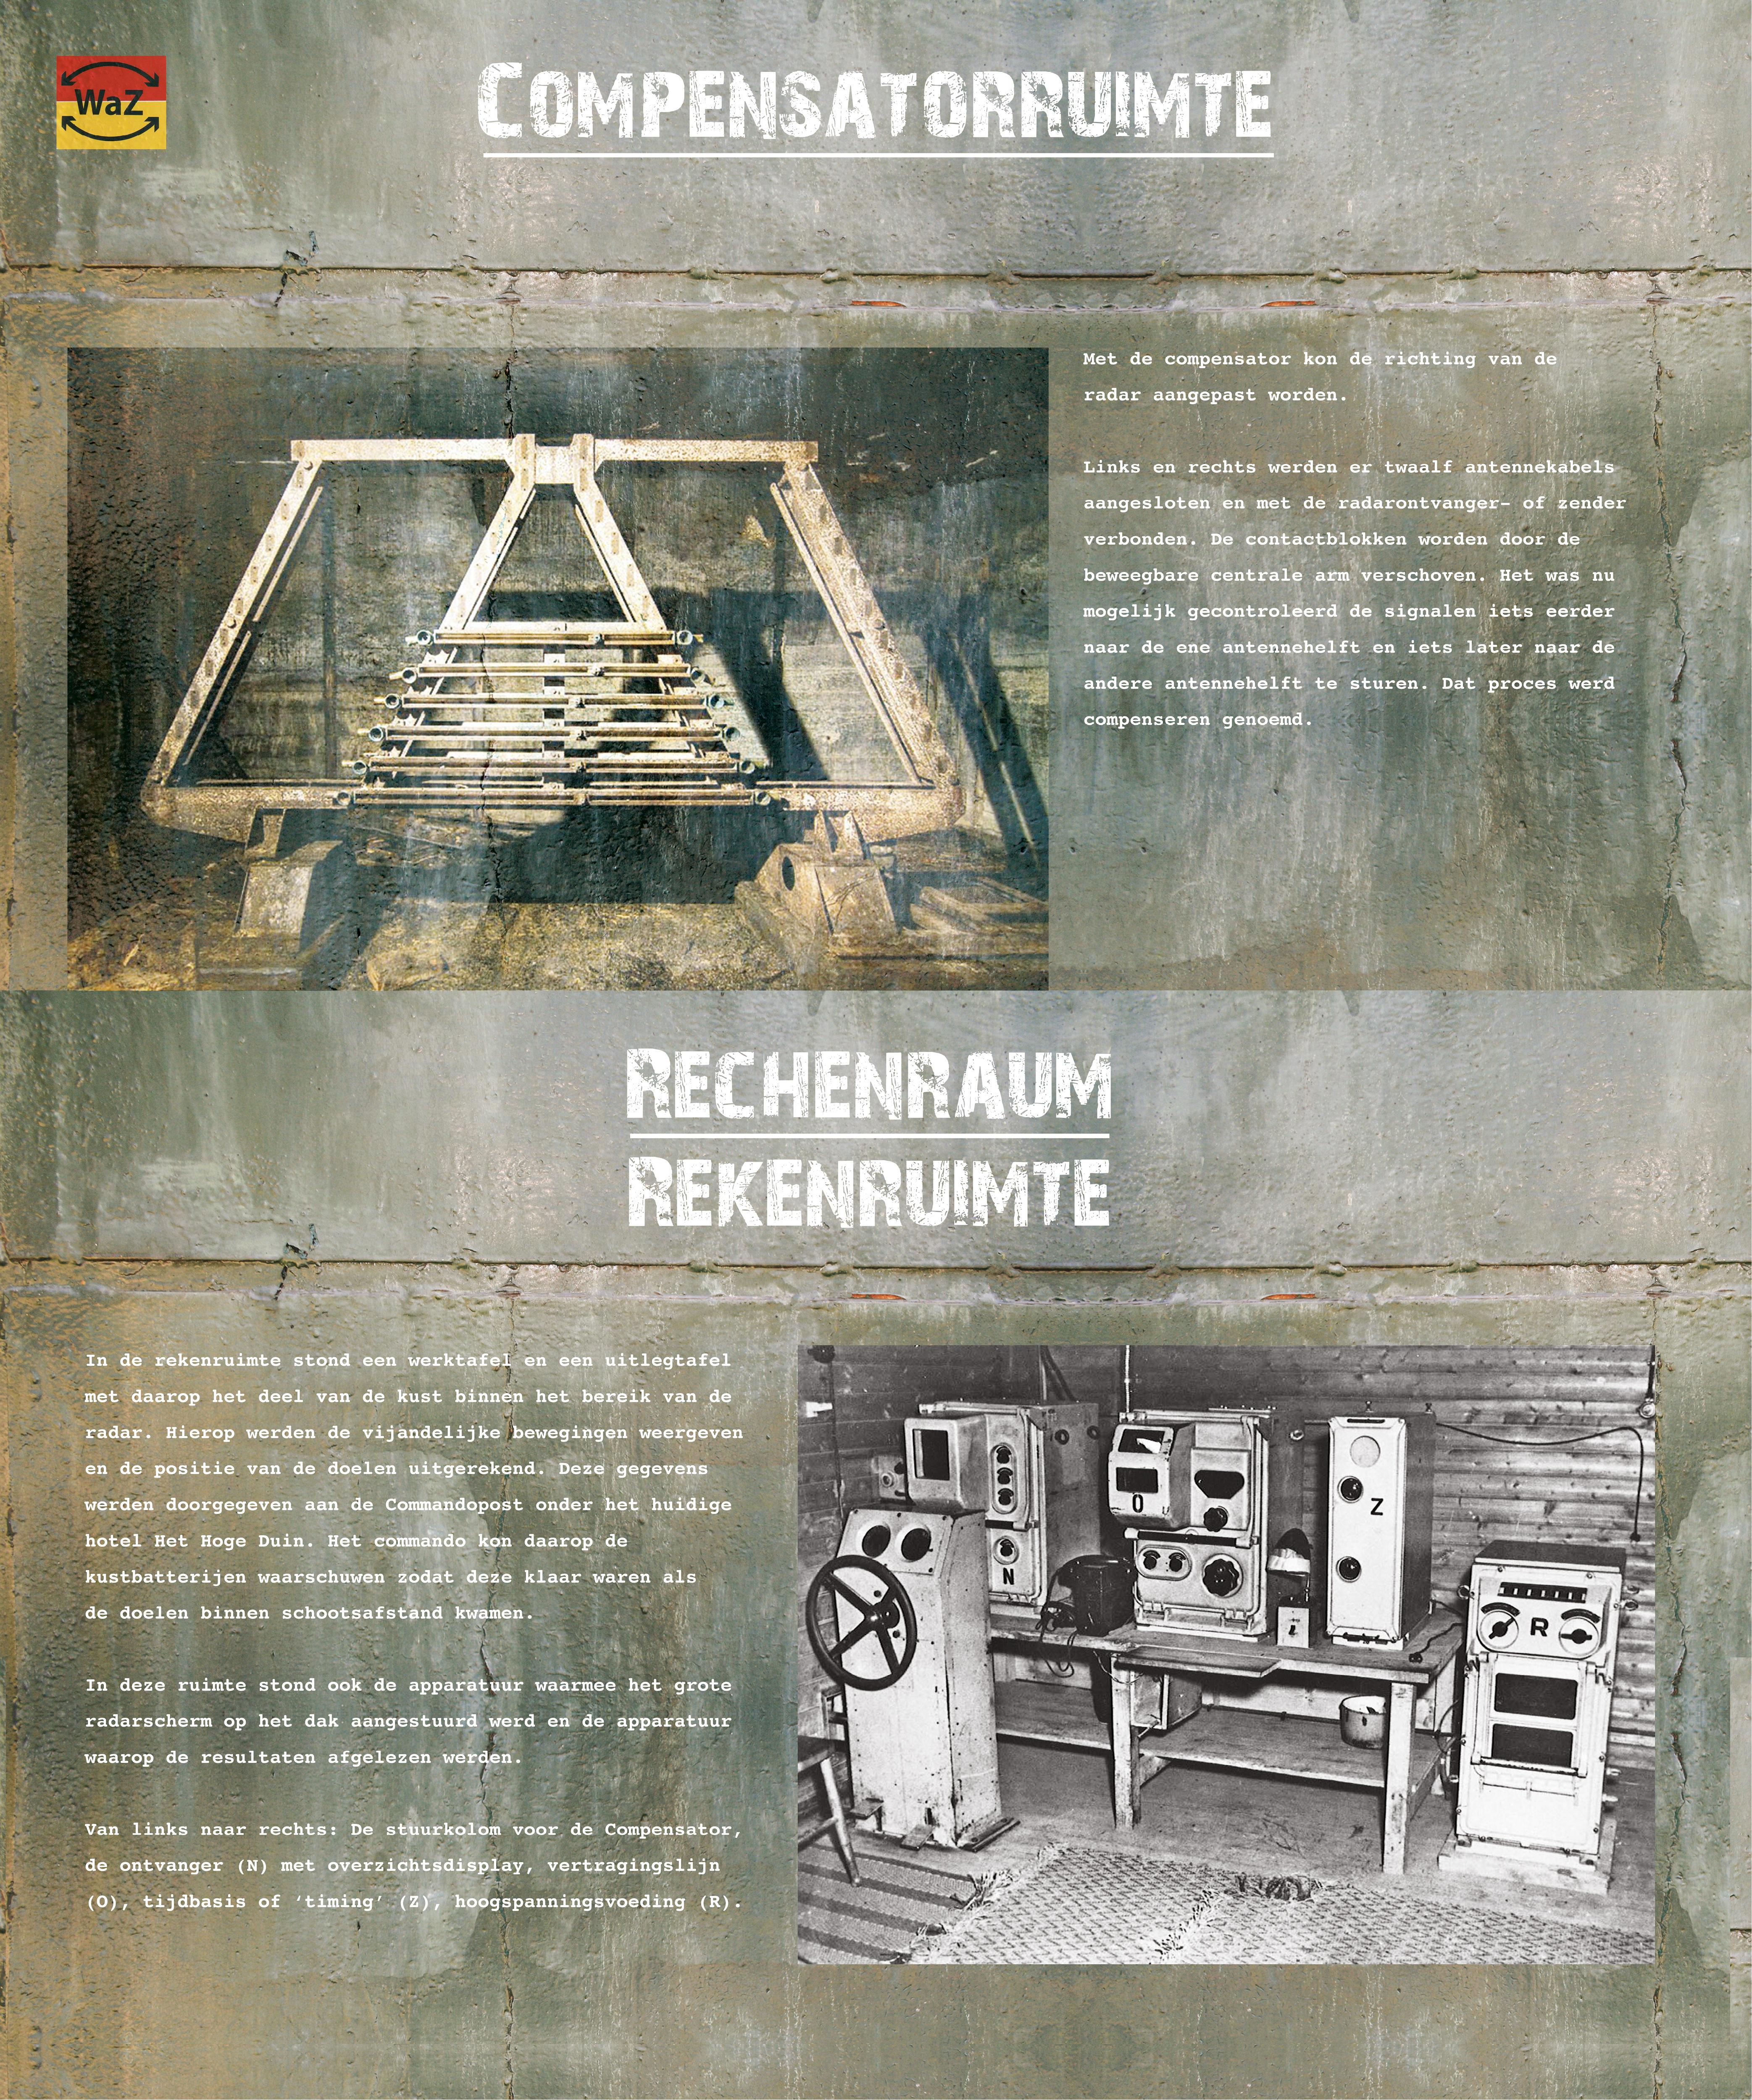 borden-bunkerwaz-70x84cm-lunettenlinie10